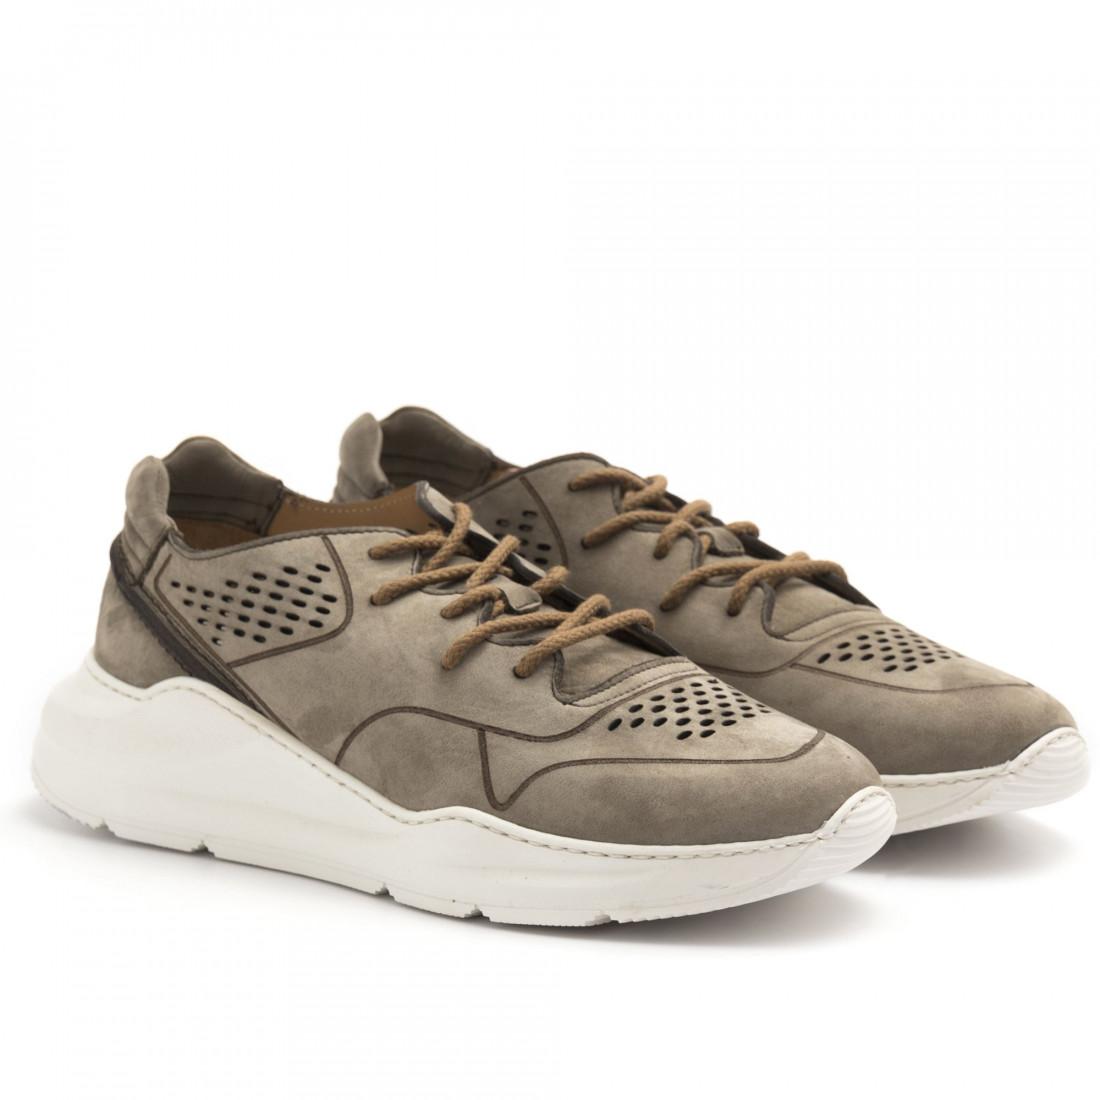 sneakers man barracuda bu3225b00mningh081 4345